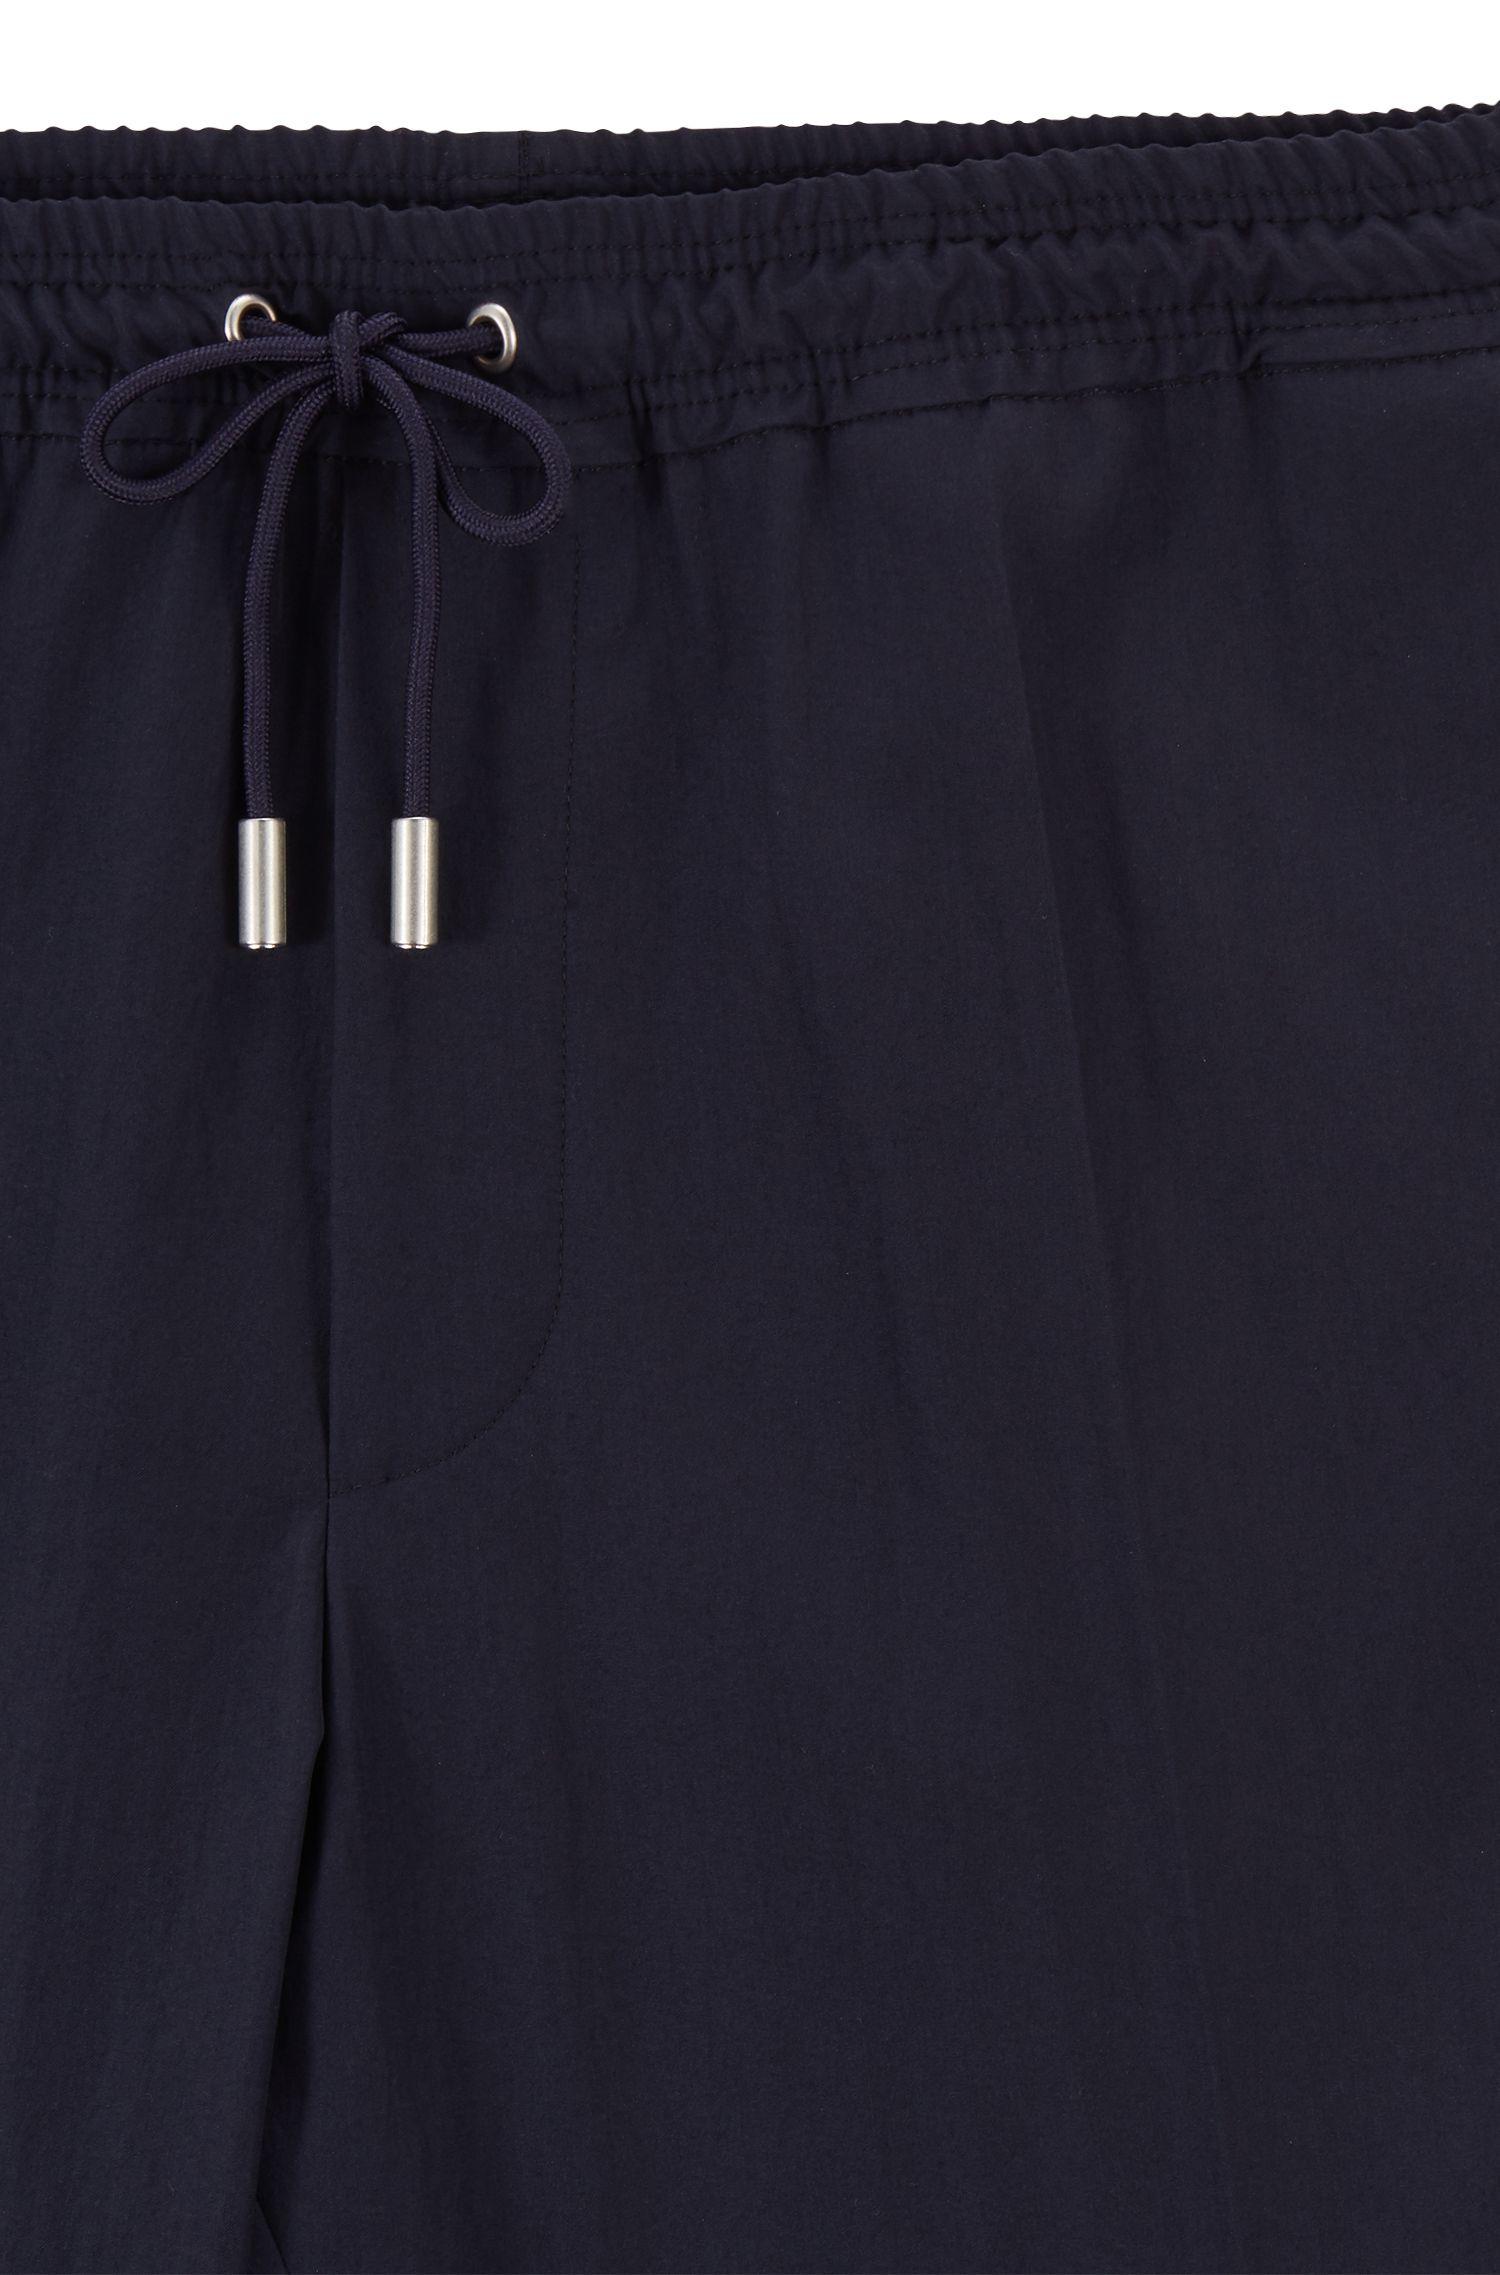 Fashion Show drawstring pants in a virgin-wool blend, Dark Blue